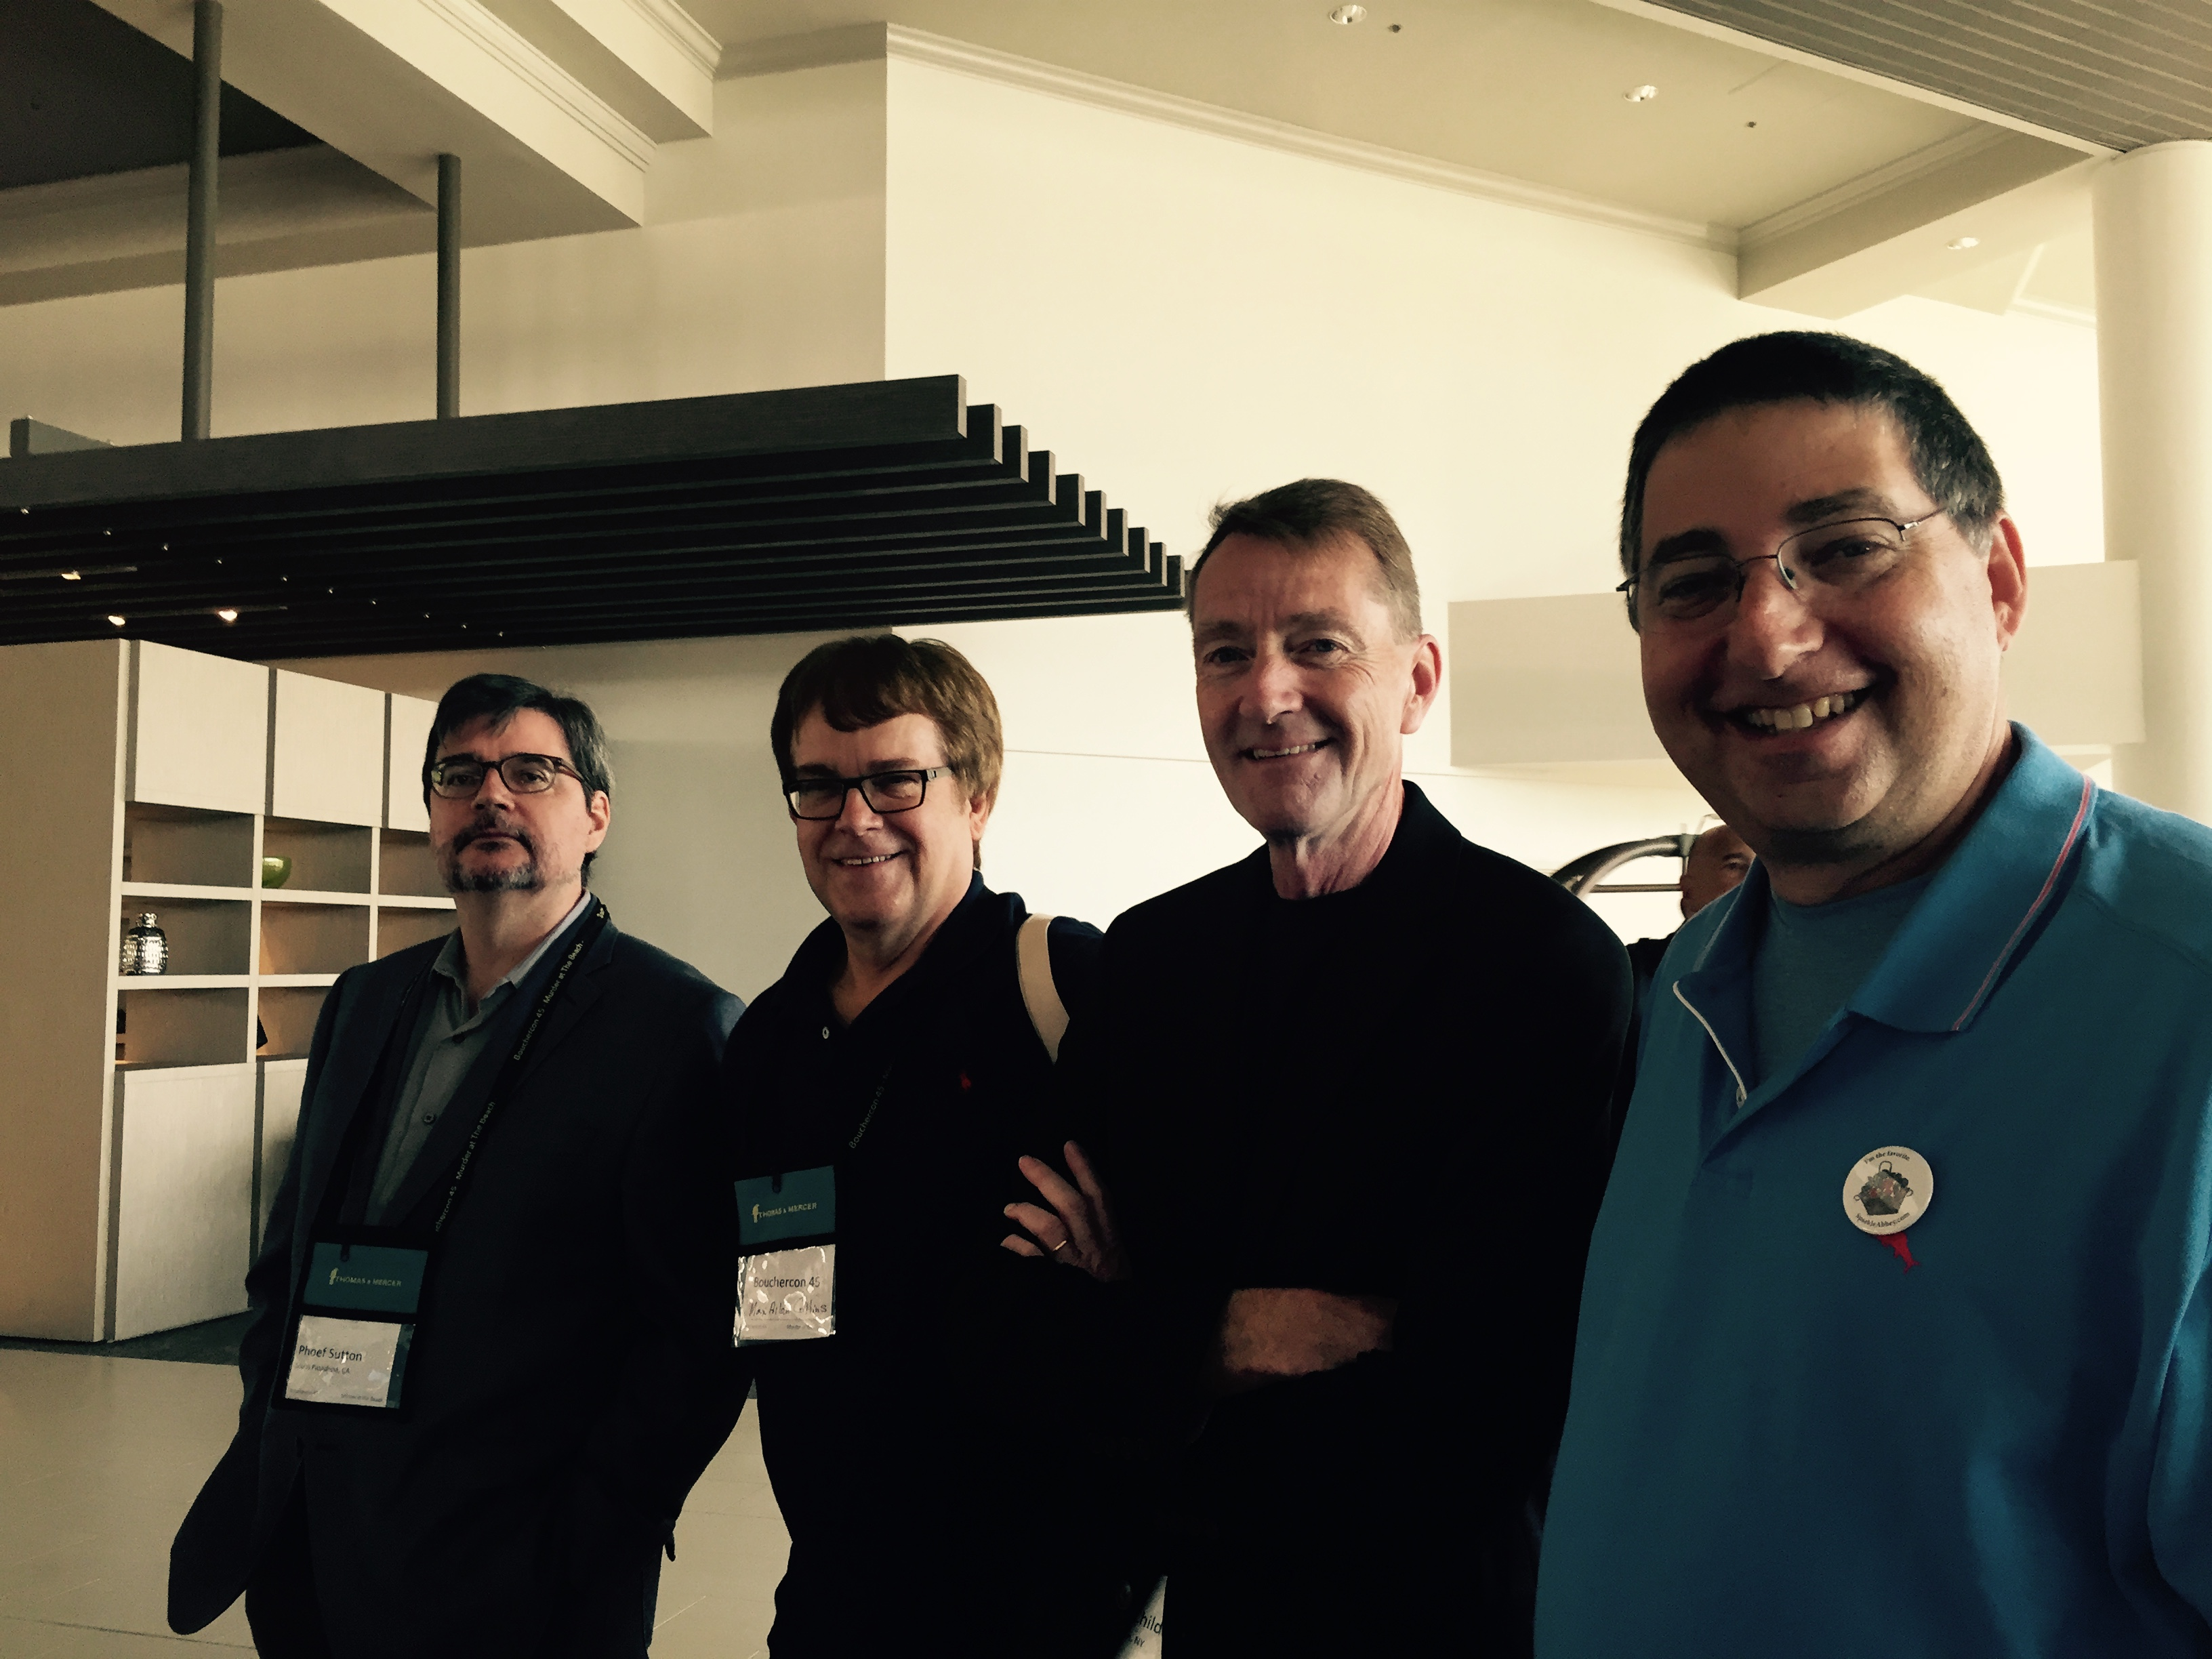 Phoef Sutton, Max Collins, Lee Child and Lee Goldberg at Bouchercon 2014